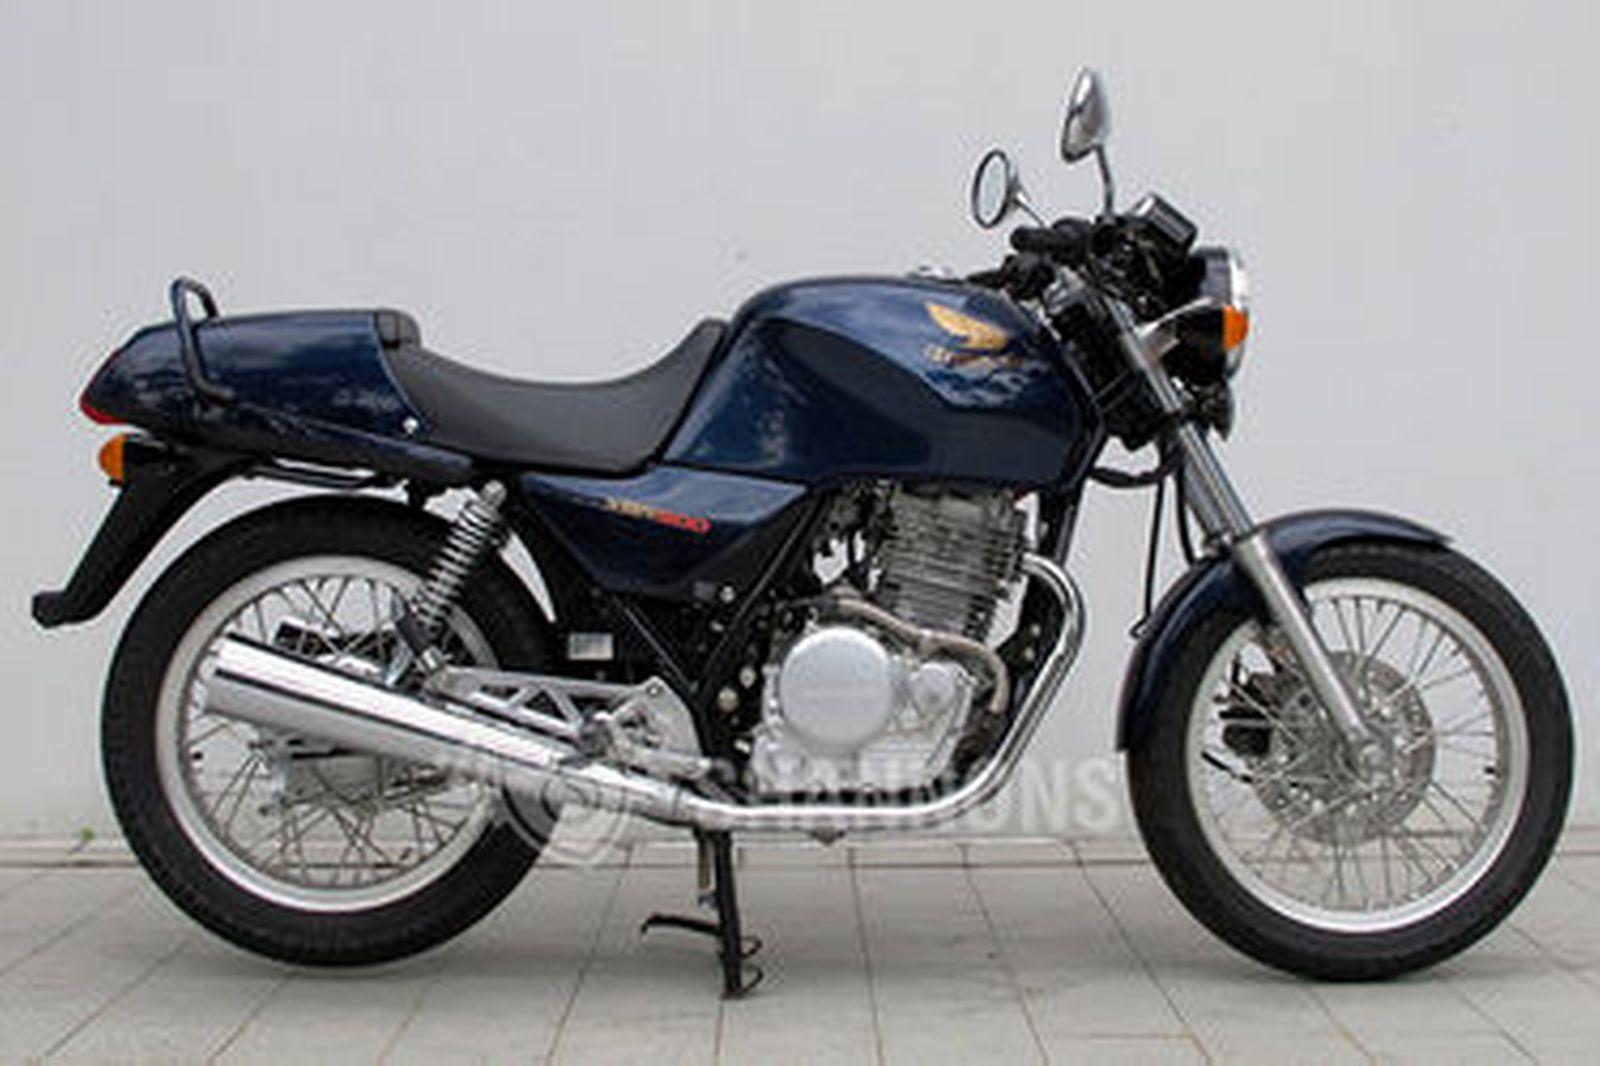 Honda Xbr 500 Wiring Diagram Library Pin Cb550 Motorcycle Diagrams Automotive On